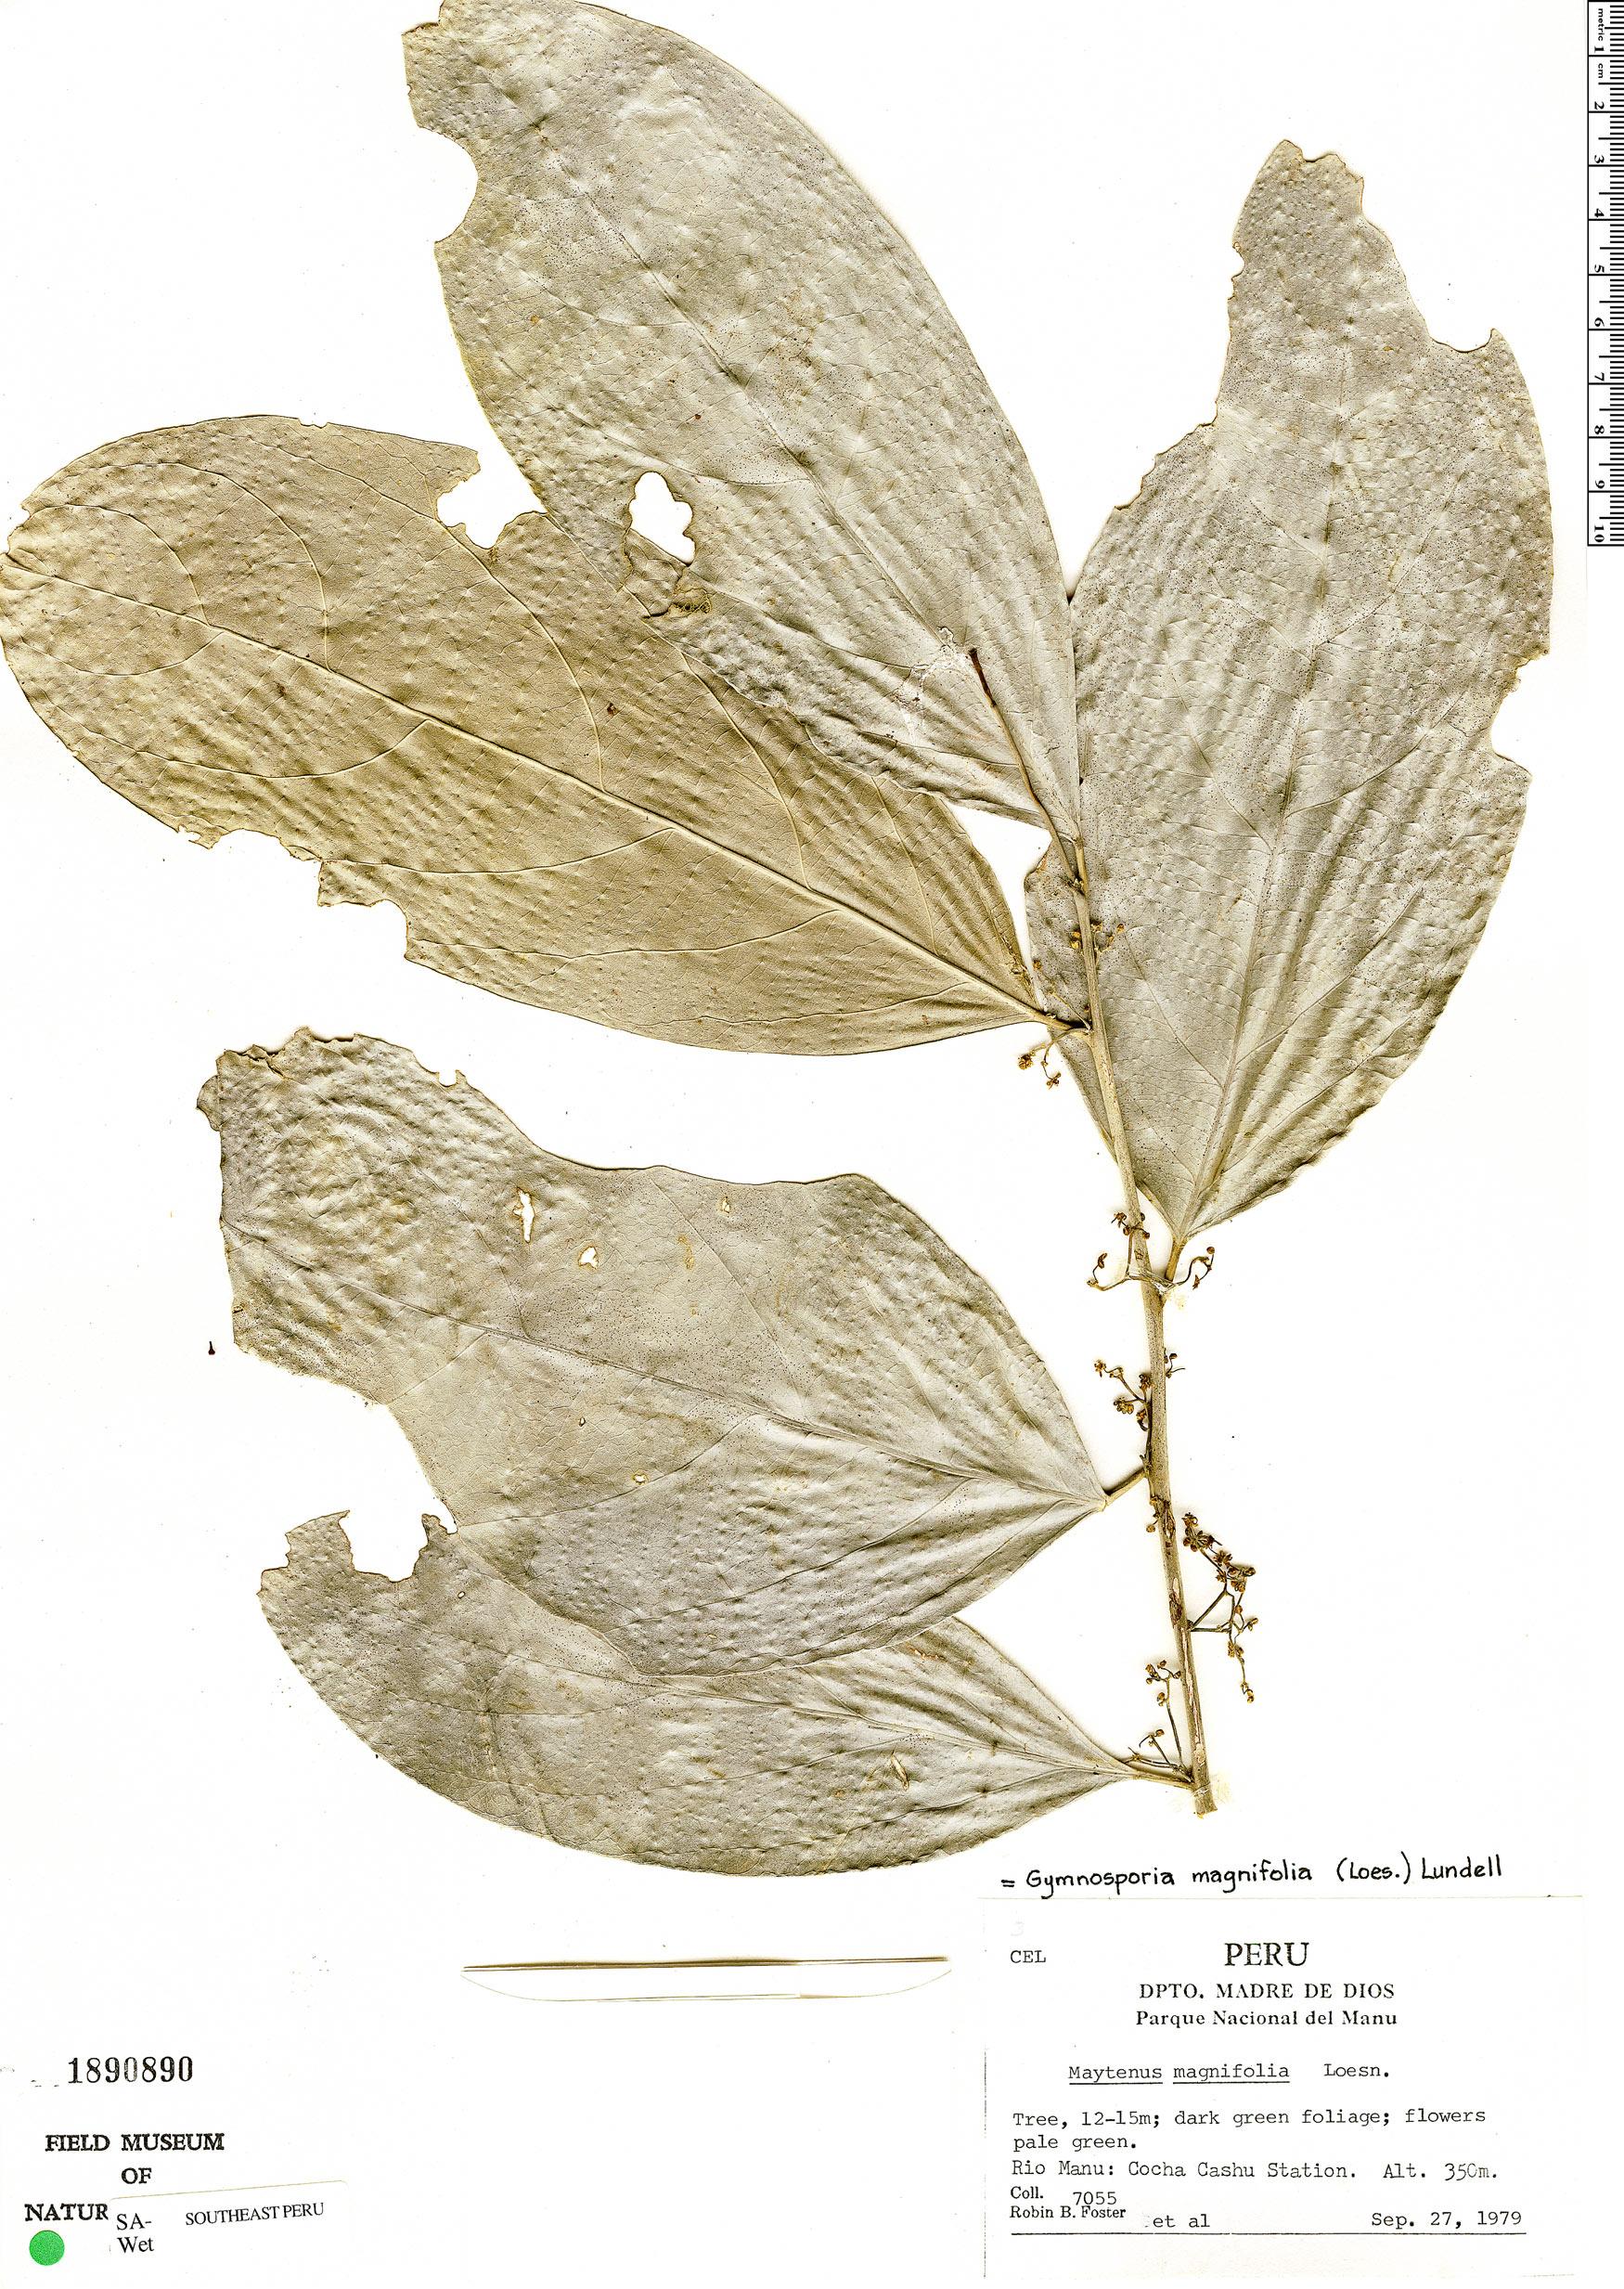 Specimen: Haydenoxylon urbanianum